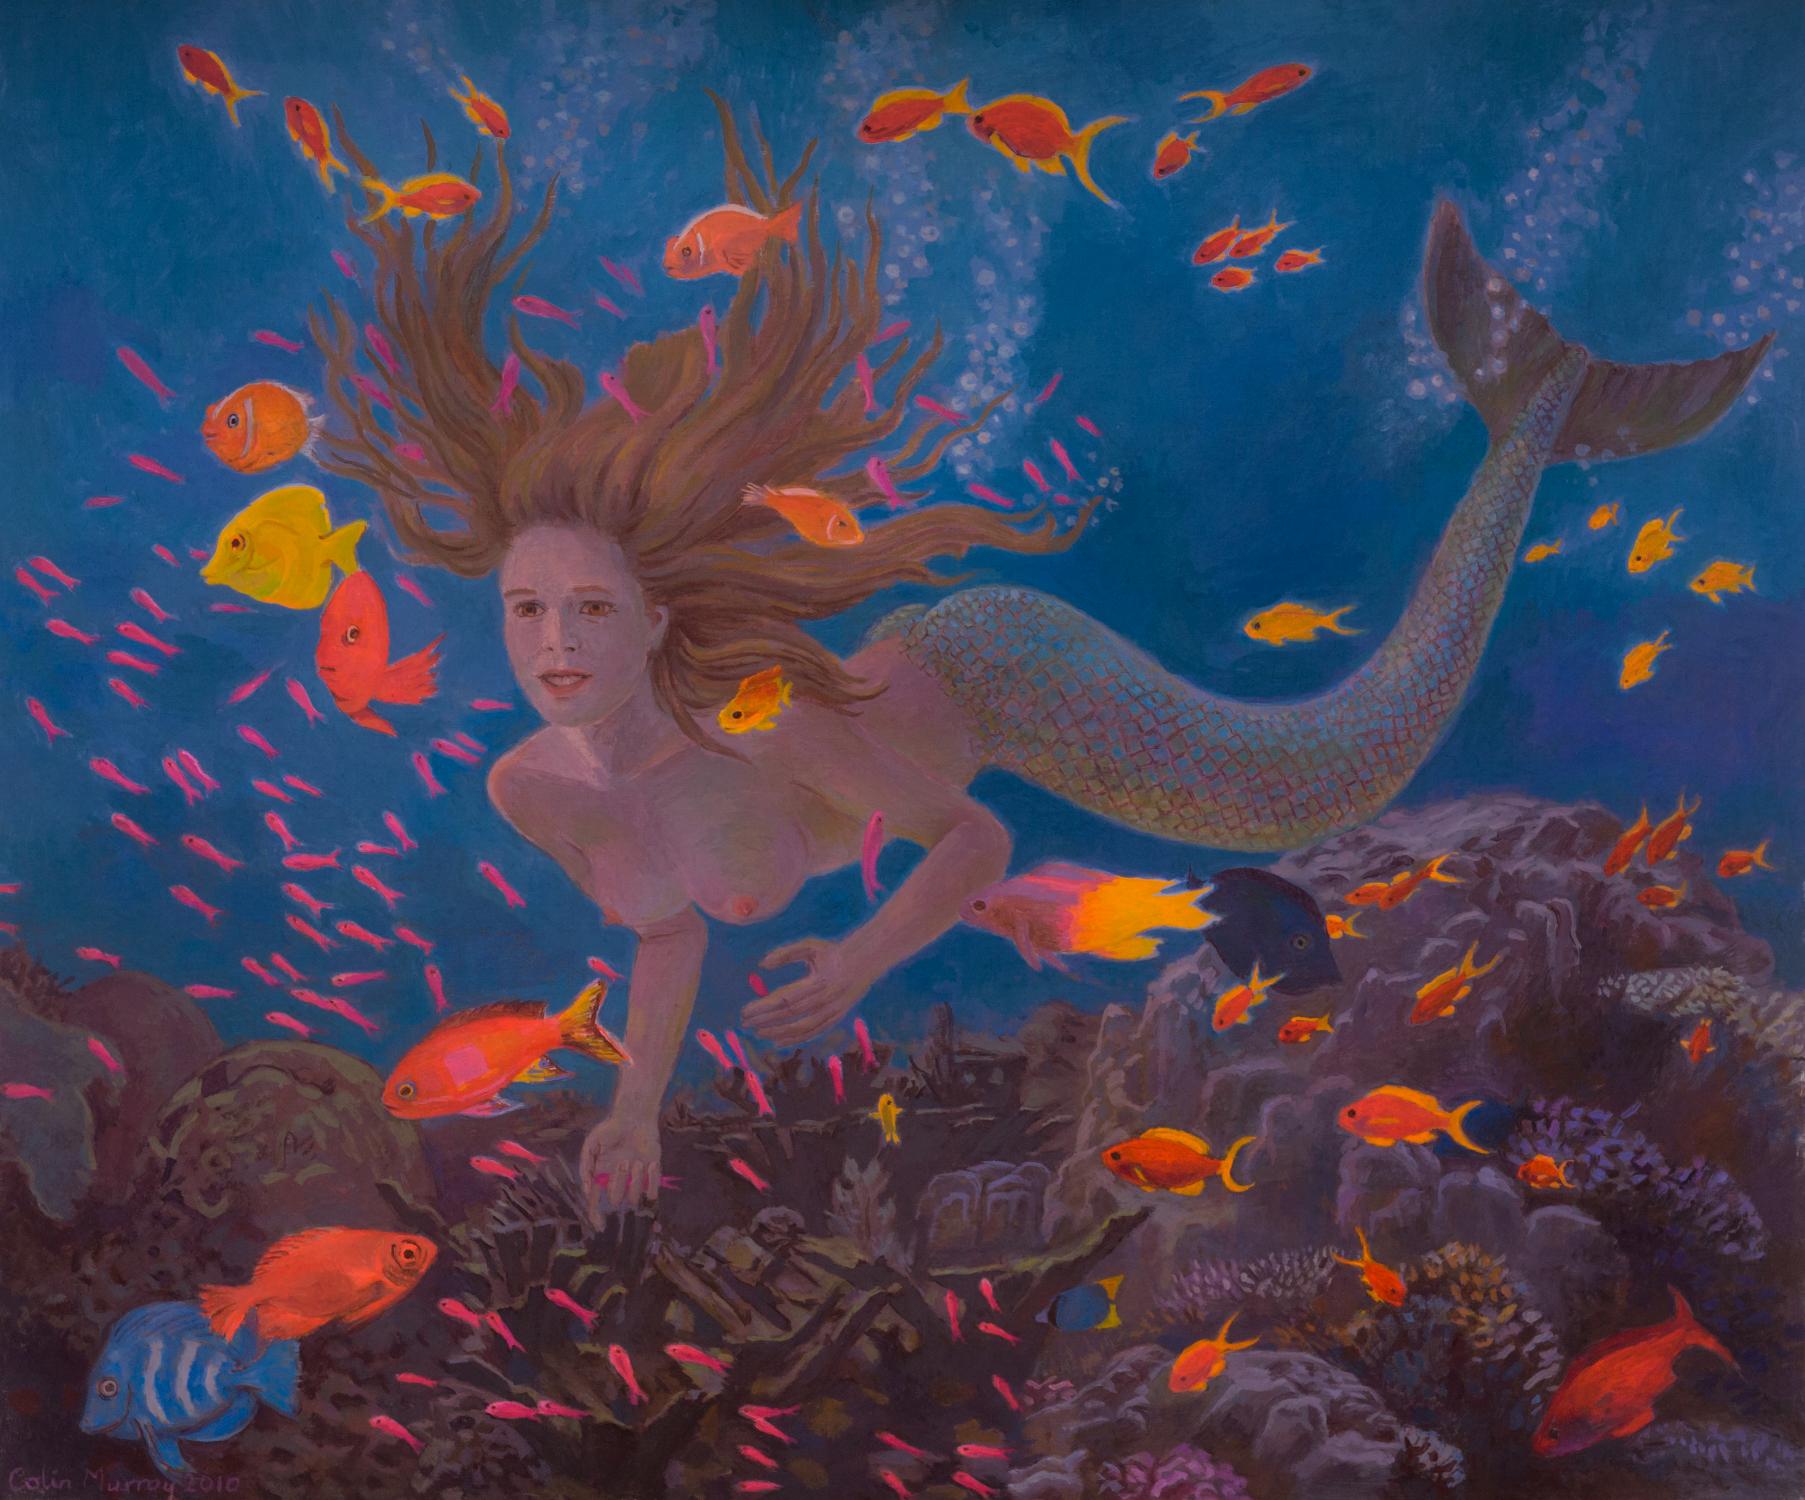 mermaid_and_fishes_darker